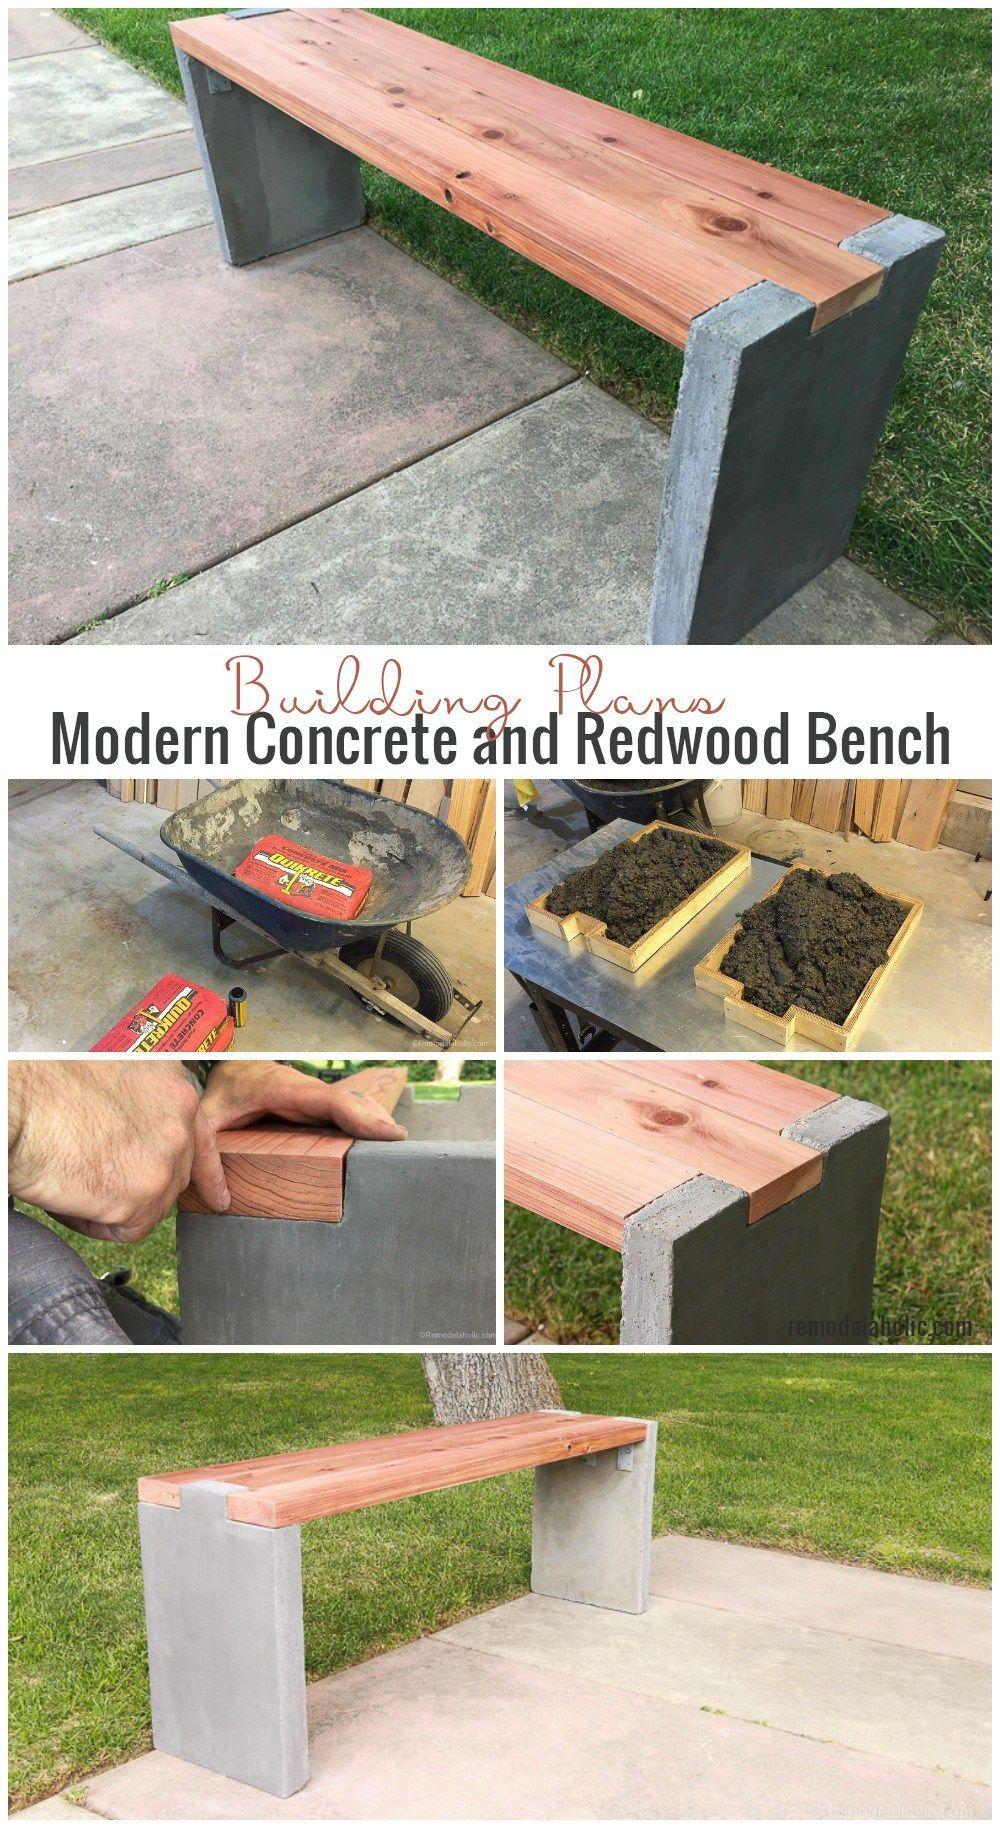 17 Awesome Diy Concrete Garden Projects V 2020 G Beton V Sadu Sadovye Proekty Sadovye Skamejki